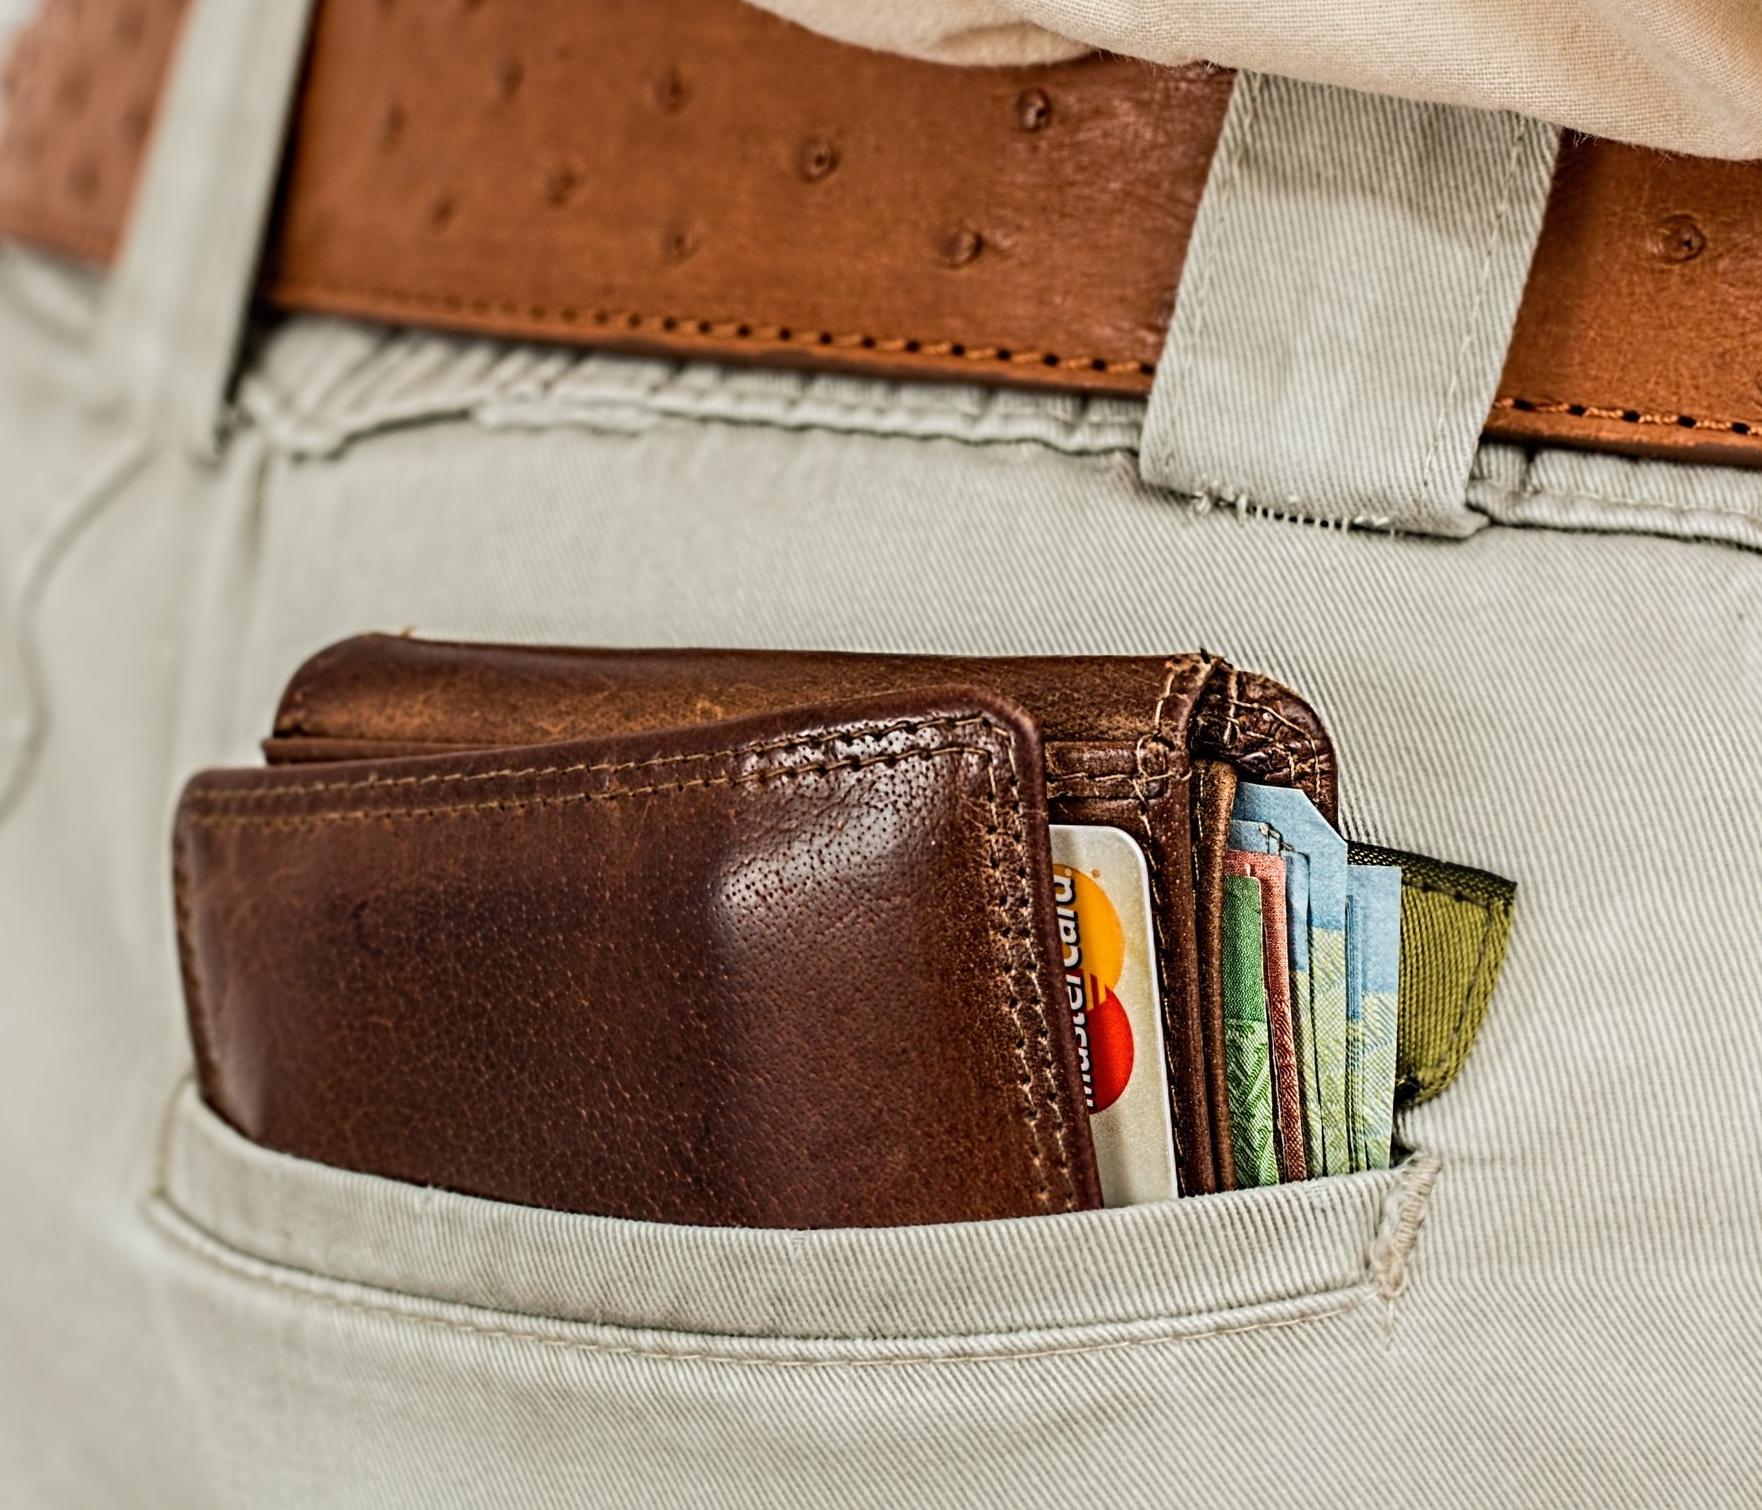 belt-cash-credit-card-33250.jpg